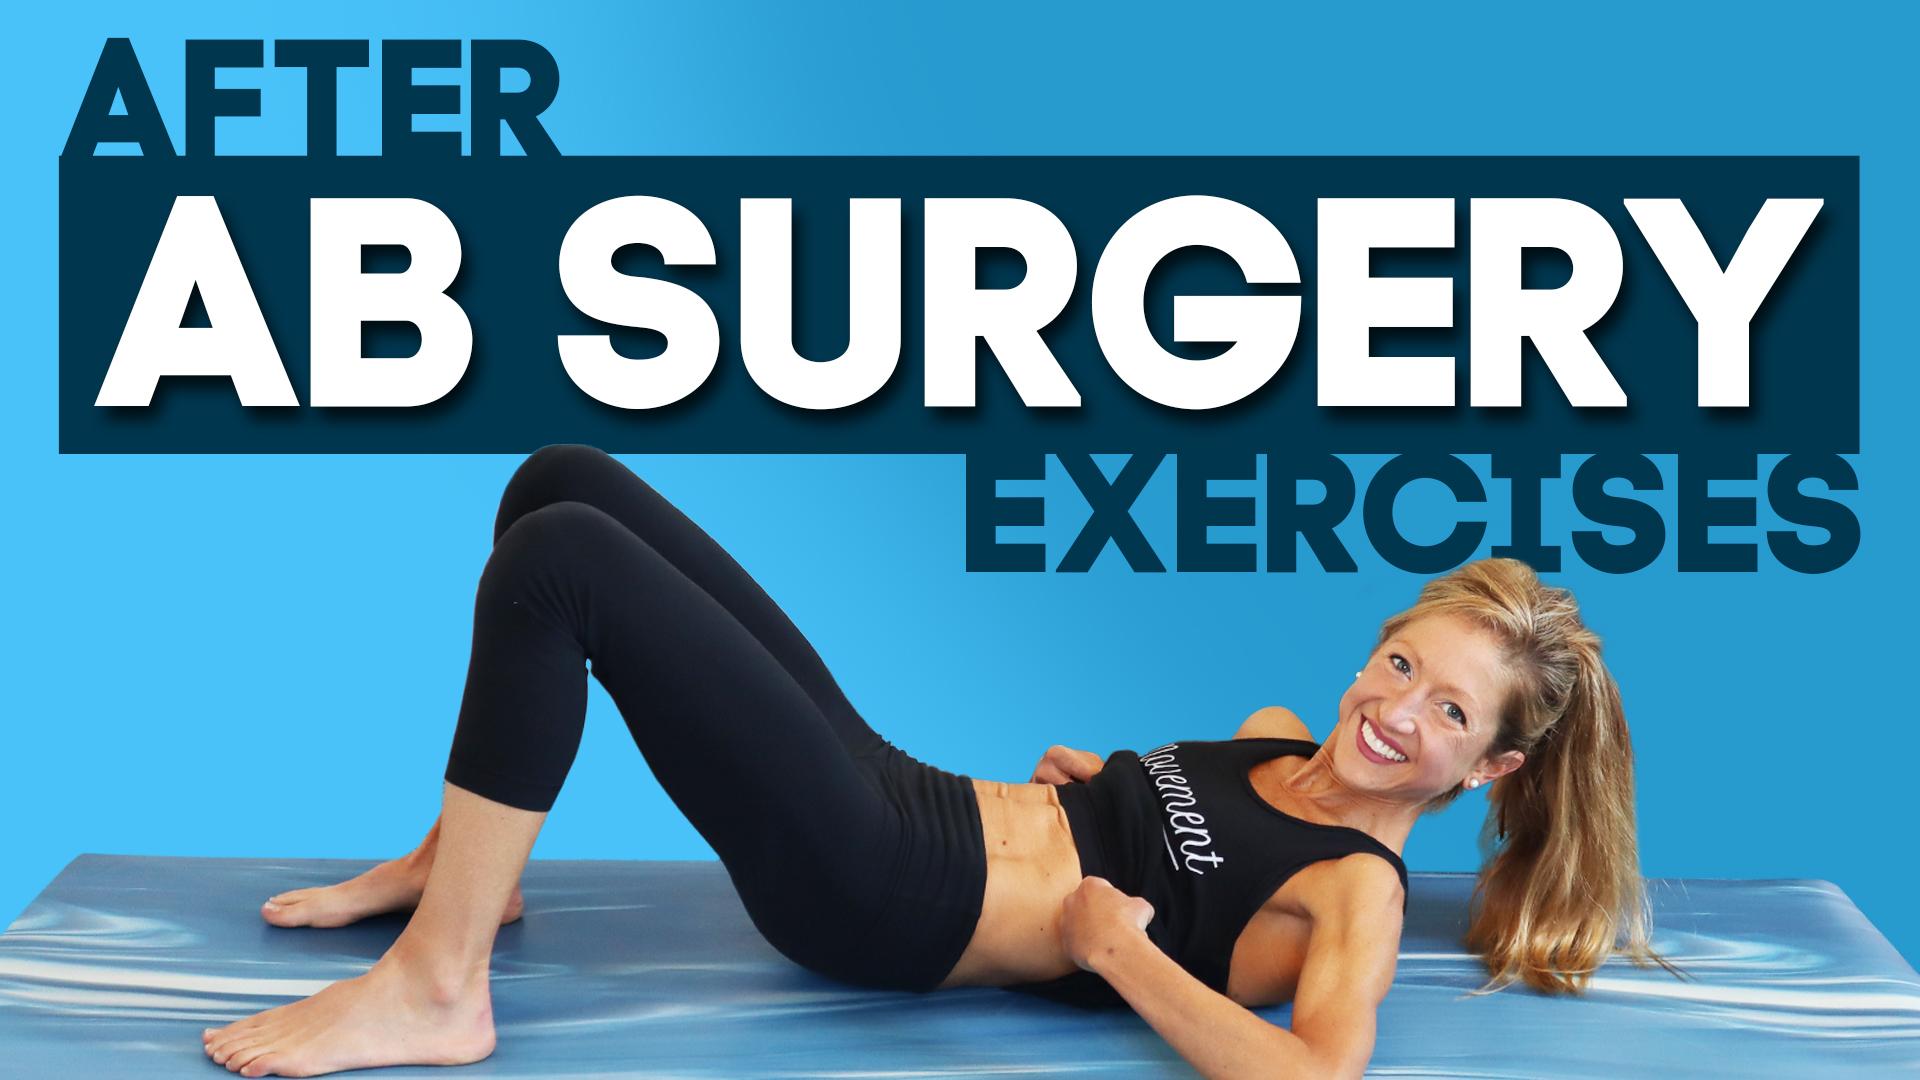 ab surgery exercises